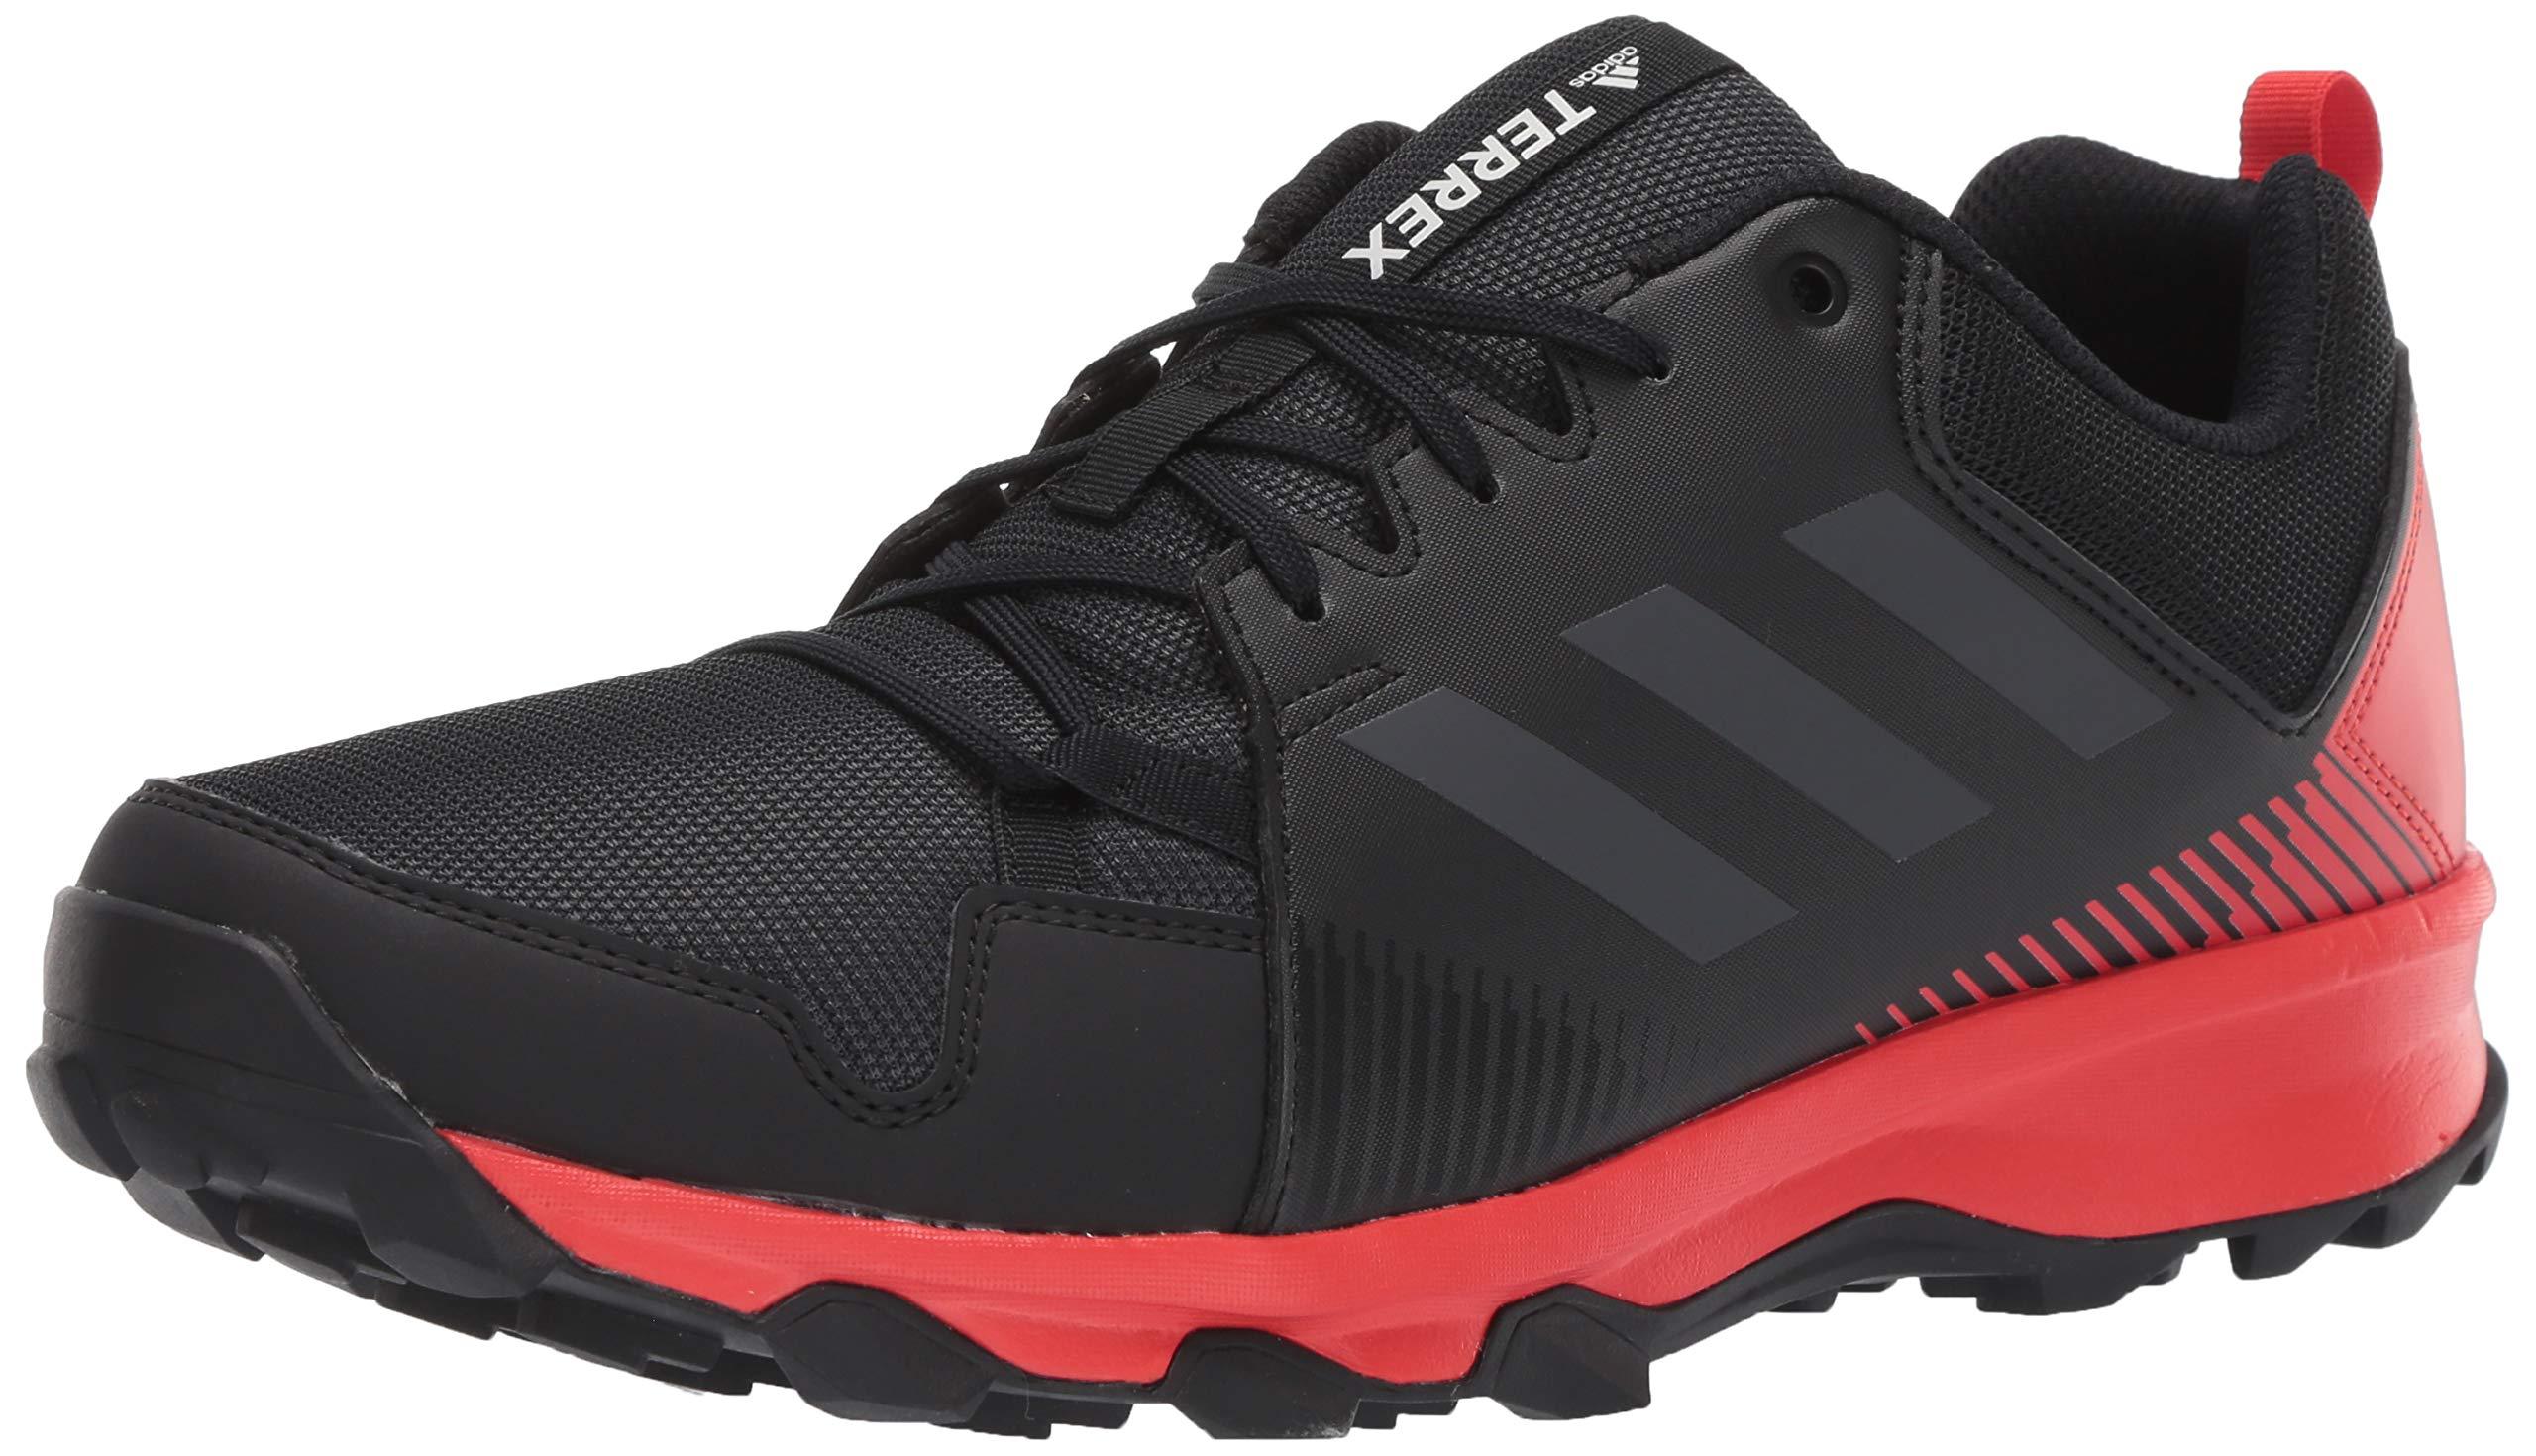 adidas outdoor Men's Terrex Tracerocker Athletic Shoe, Black/Carbon/Active RED, 10.5 D US by adidas outdoor